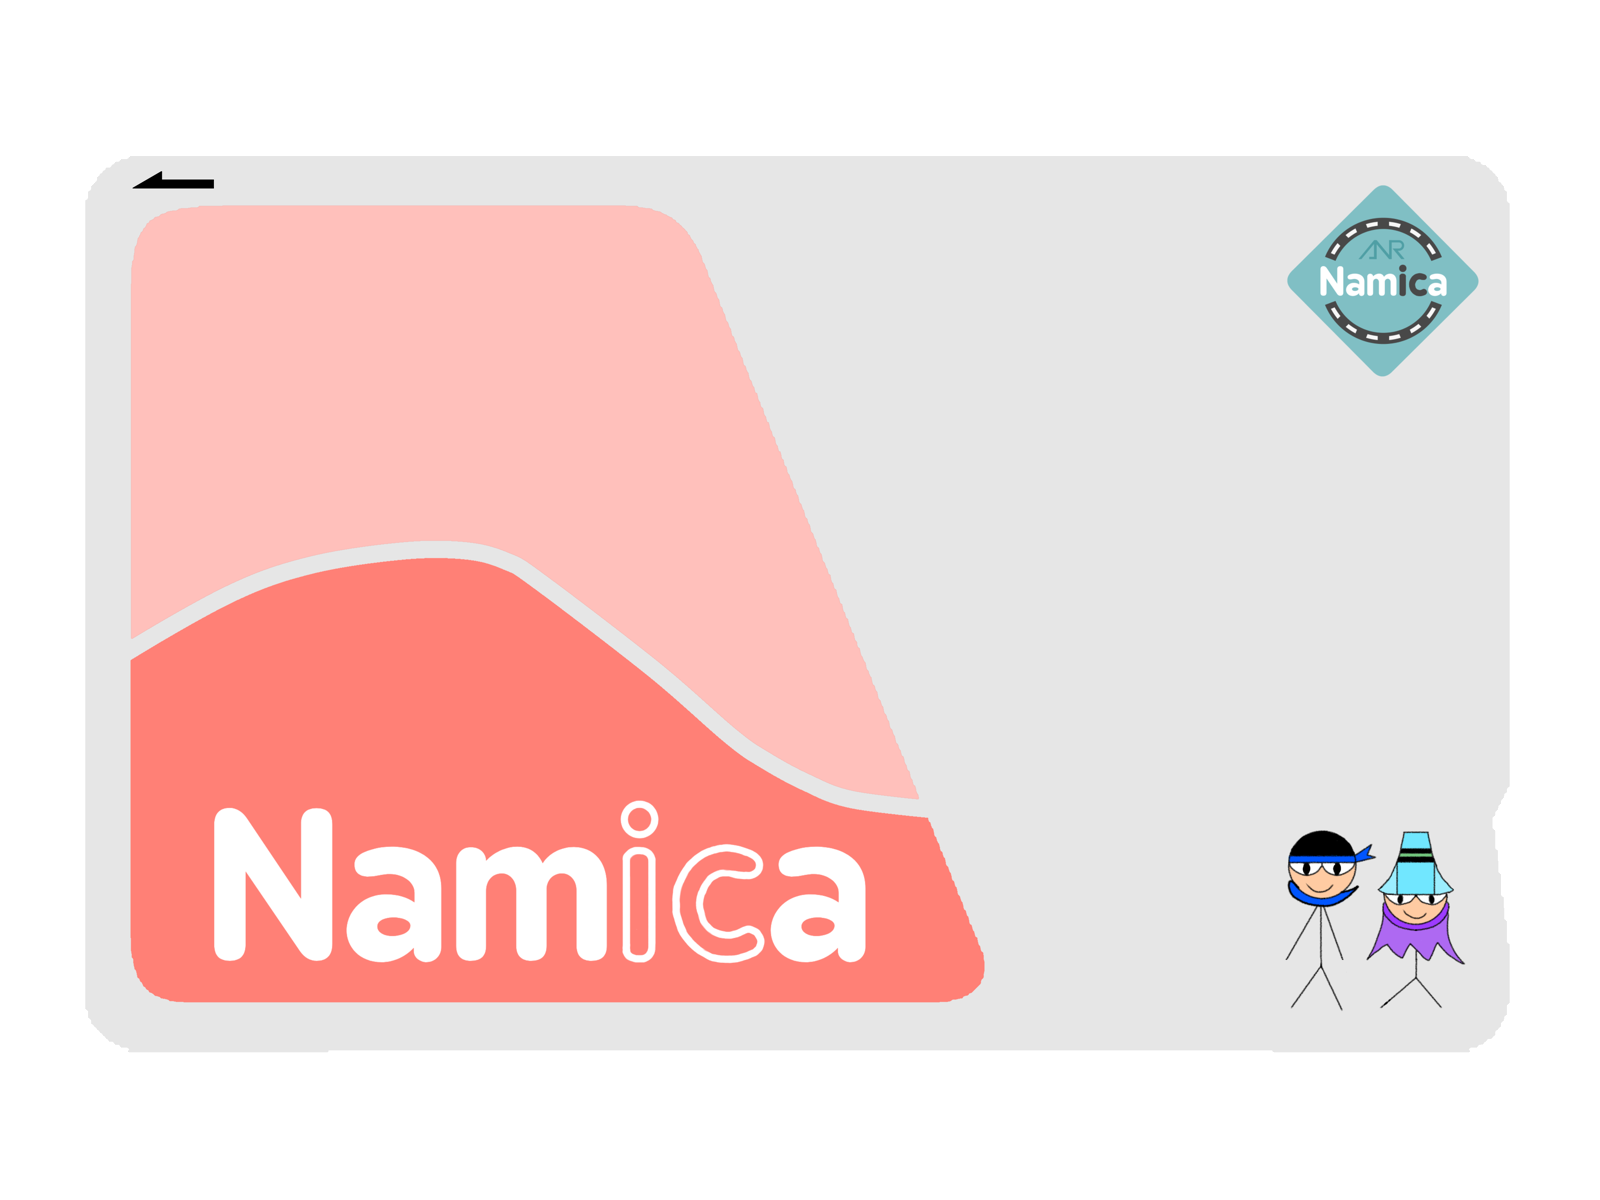 Namica-02.png